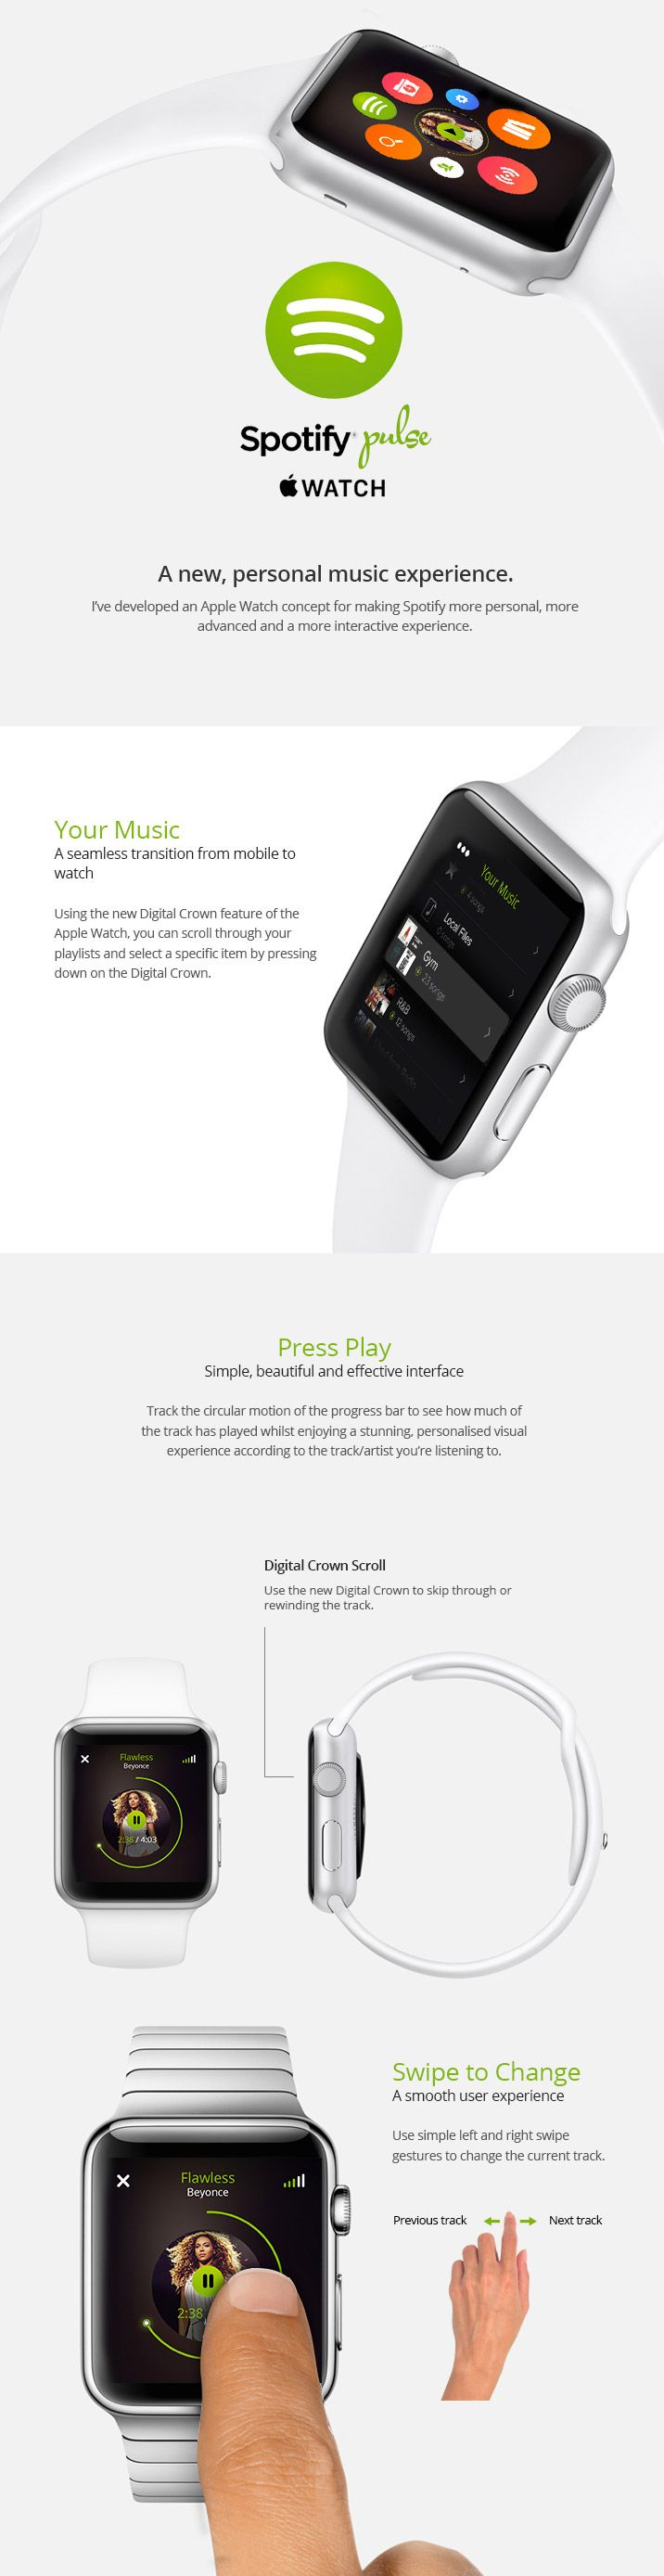 Spotify Pulse - Apple Watch UI http://www.cssdesignawards.com/articles/23-smartwatch-ui-designs-concepts/114/